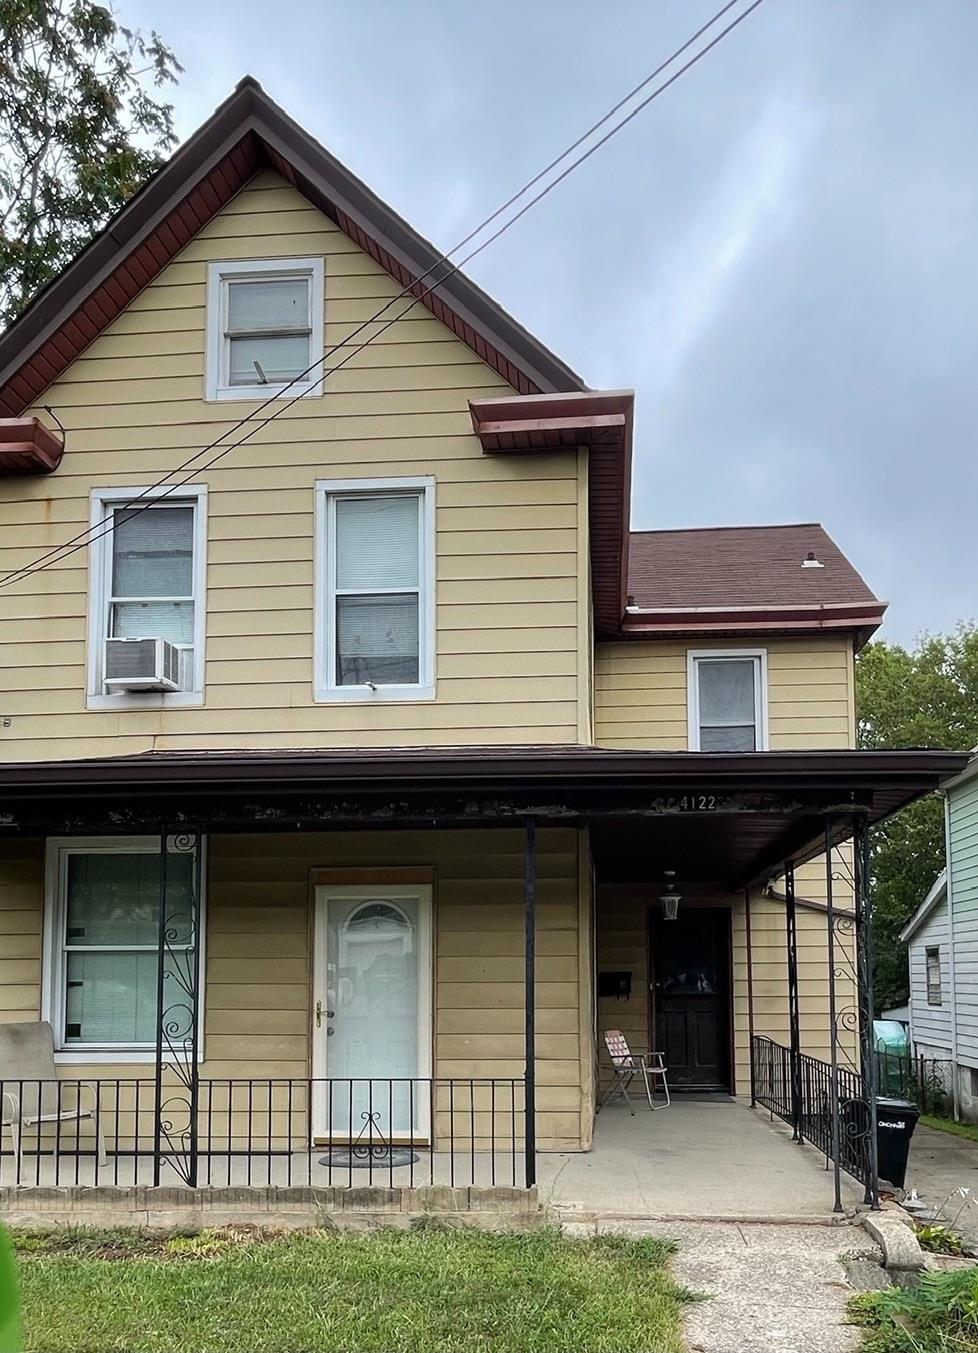 4122 Flower Avenue, Cincinnati, Ohio 45205, 5 Bedrooms Bedrooms, 9 Rooms Rooms,2 BathroomsBathrooms,Single Family Residence,For Sale,Flower,1714870